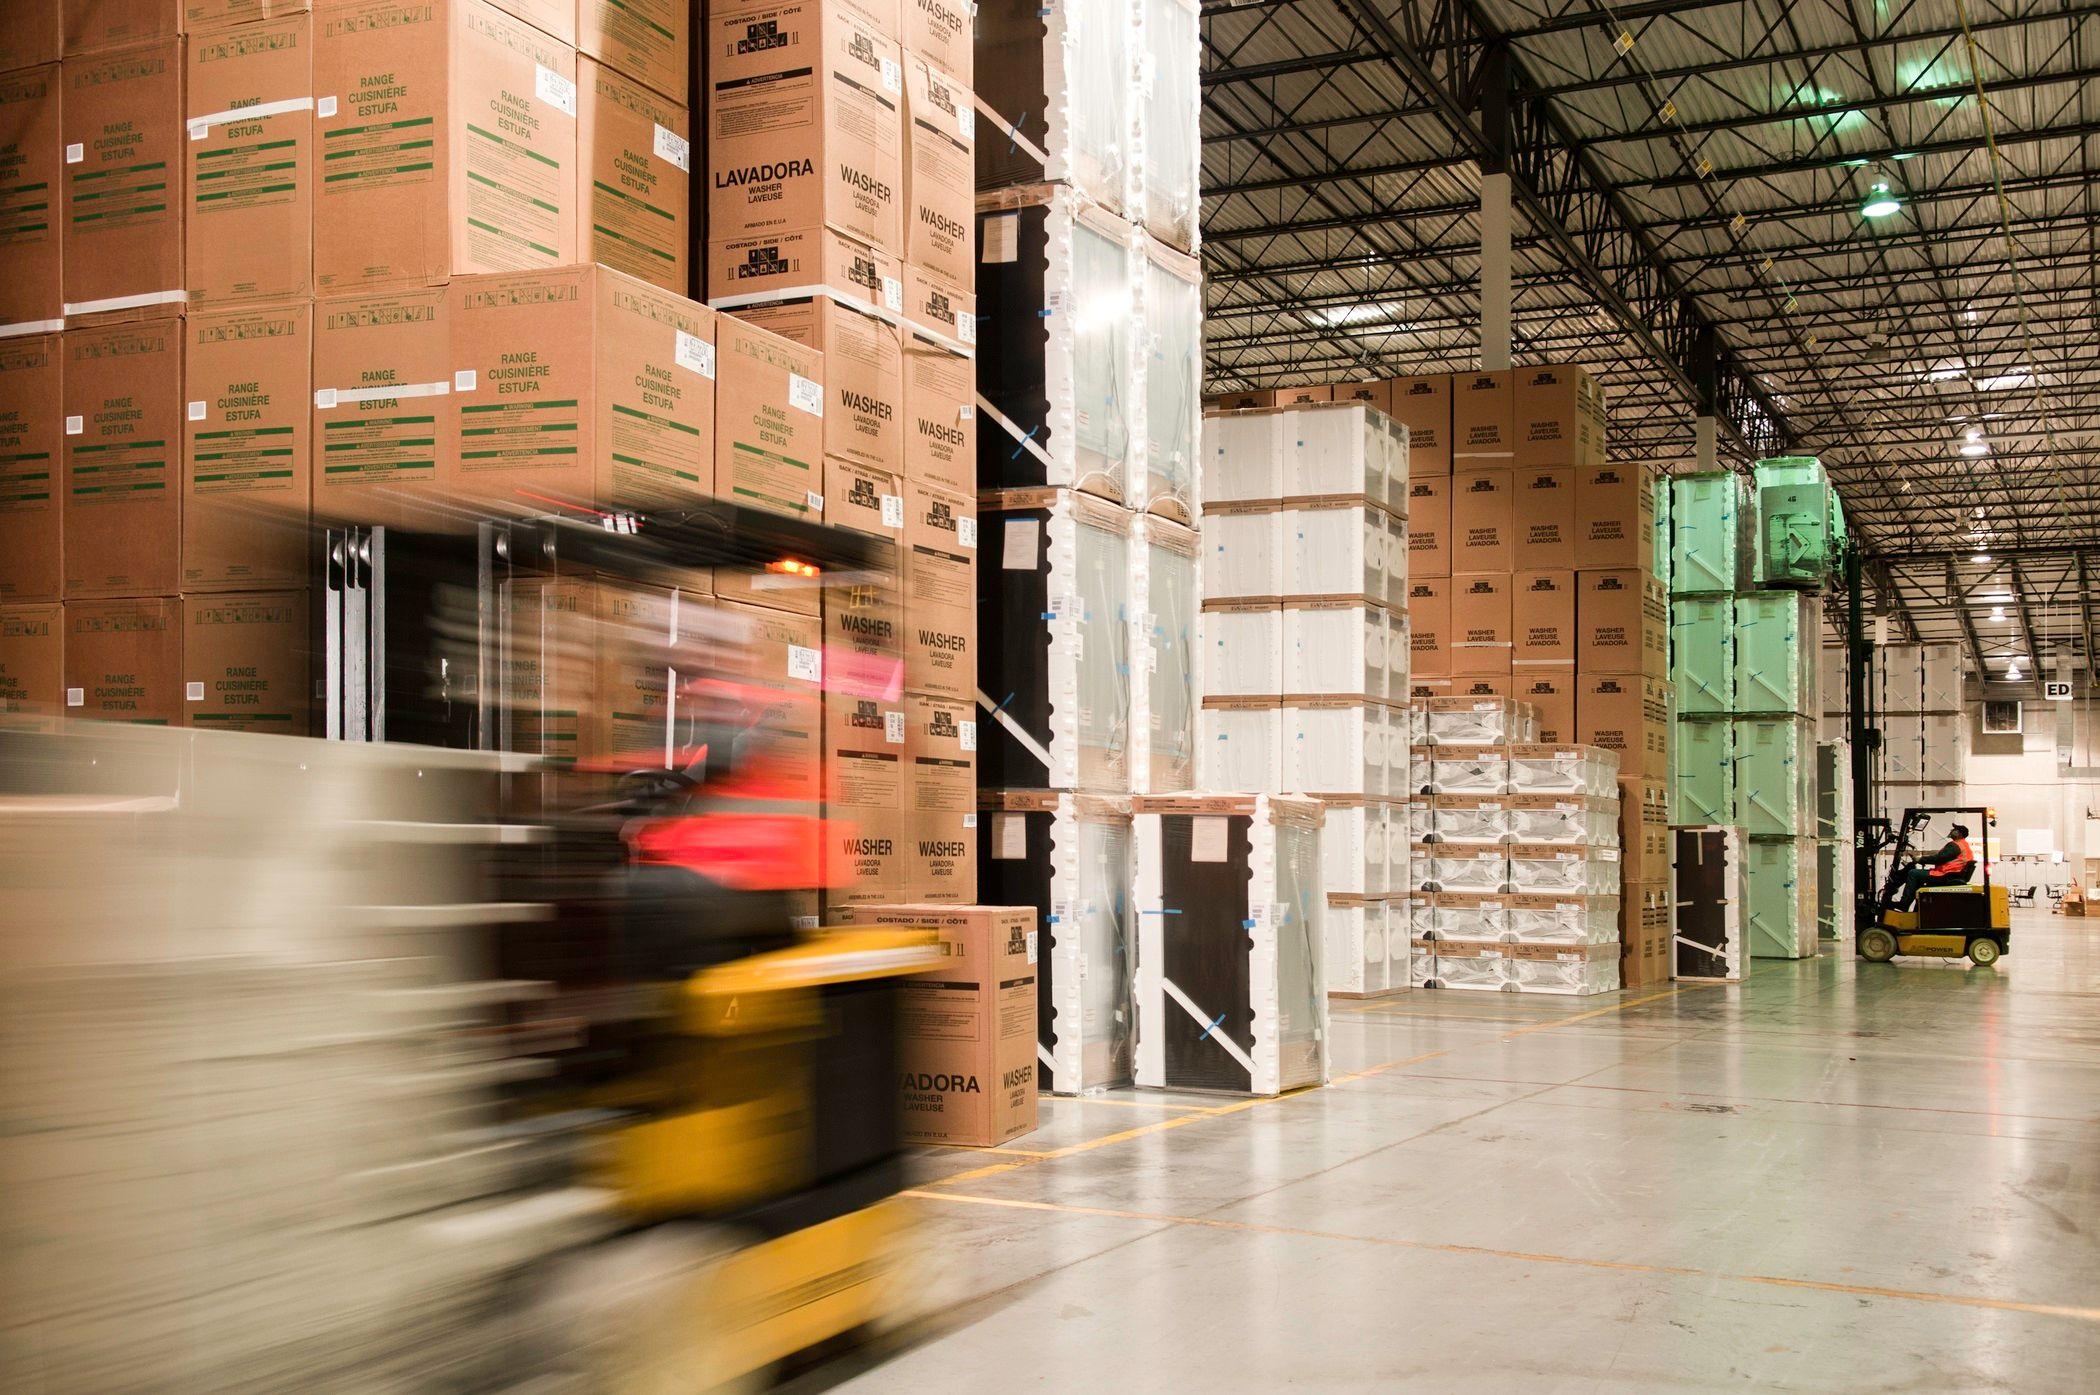 Penske Logistics Safety Leader to Take Part in Workplace Safety Webinar